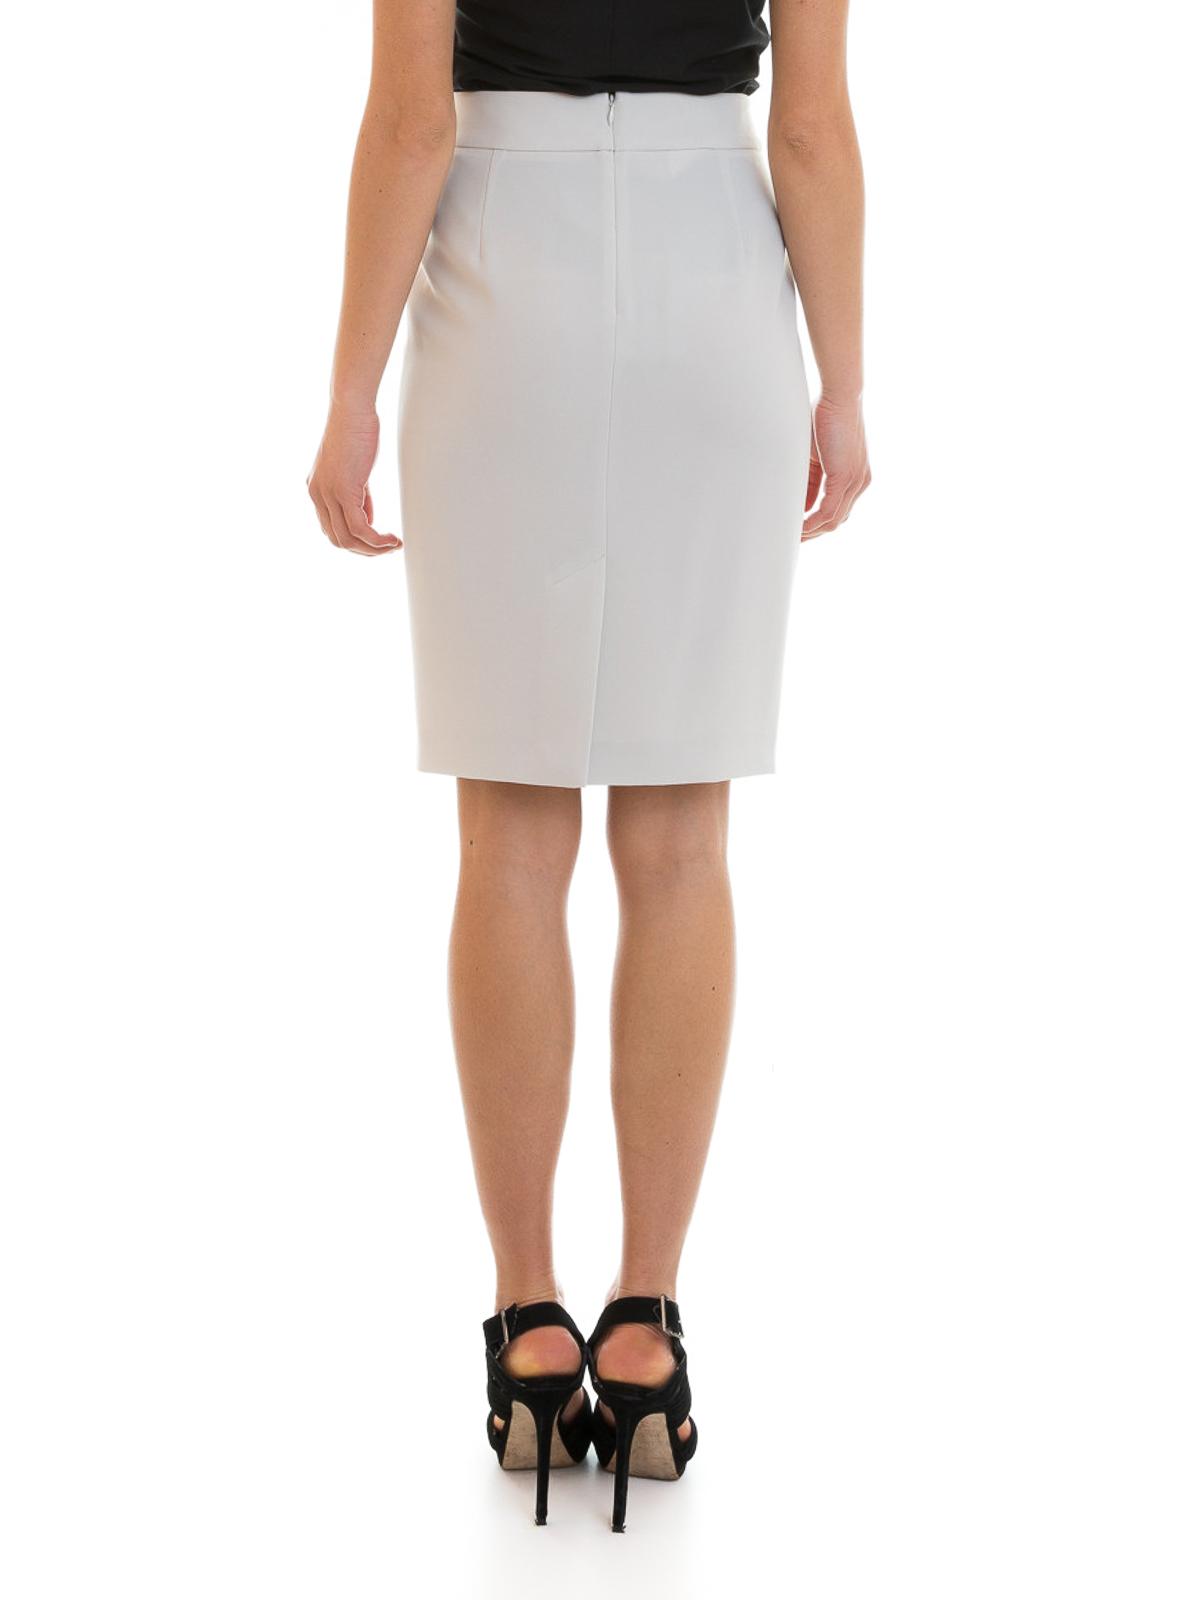 Armani Collezioni Knee-Length Straight Skirt Fast Delivery Finishline Cheap Online 2018 Newest Cheap Price Footlocker O9Bk0Gu0b